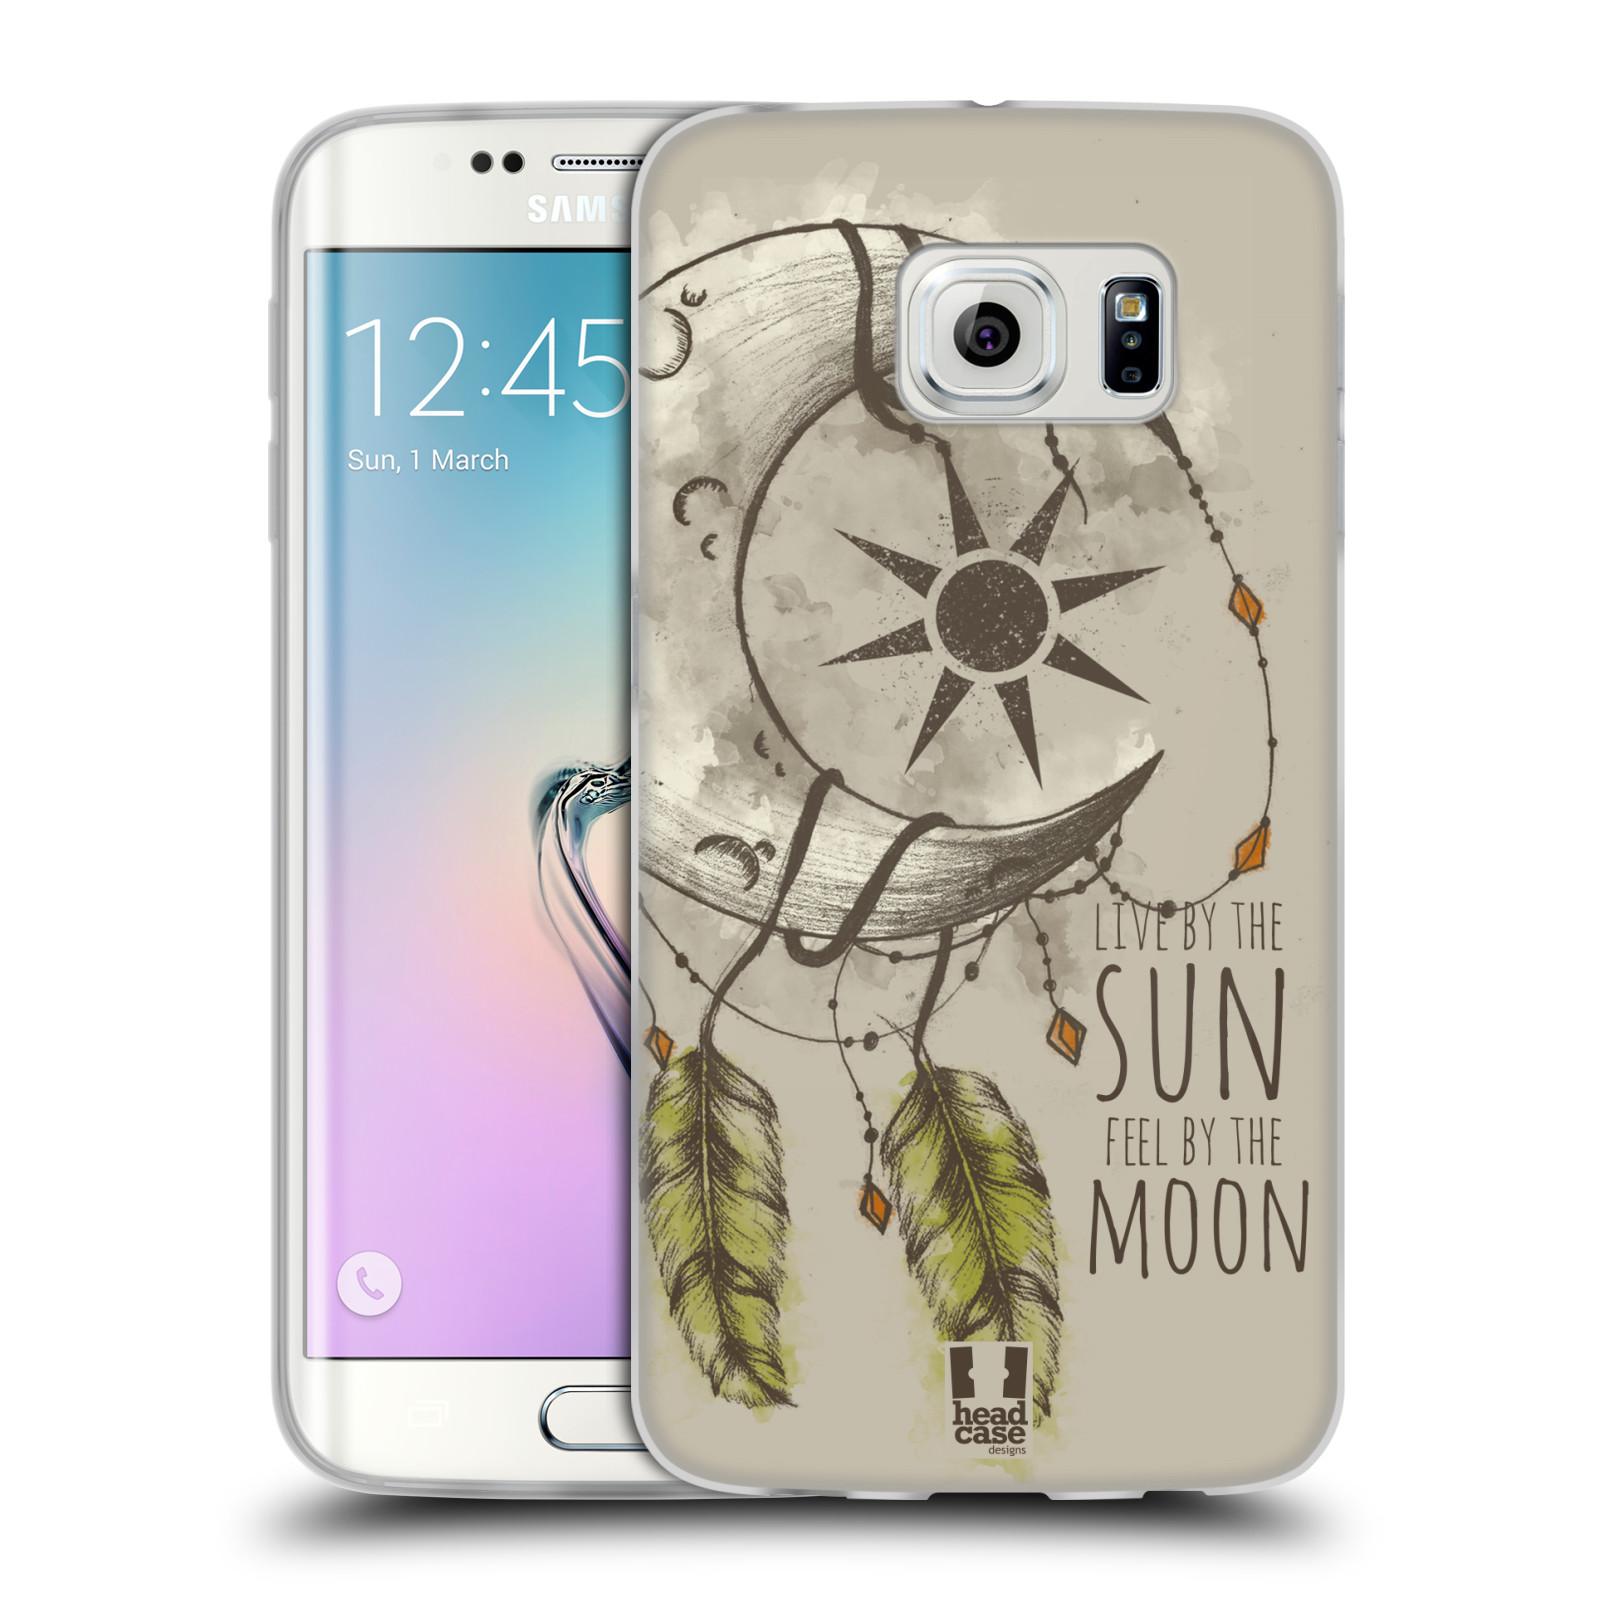 Silikonové pouzdro na mobil Samsung Galaxy S6 Edge - Head Case - Bohémský lapač (Silikonový kryt či obal na mobilní telefon s motivem Bohemian Soul pro Samsung Galaxy S6 Edge SM-G925F)